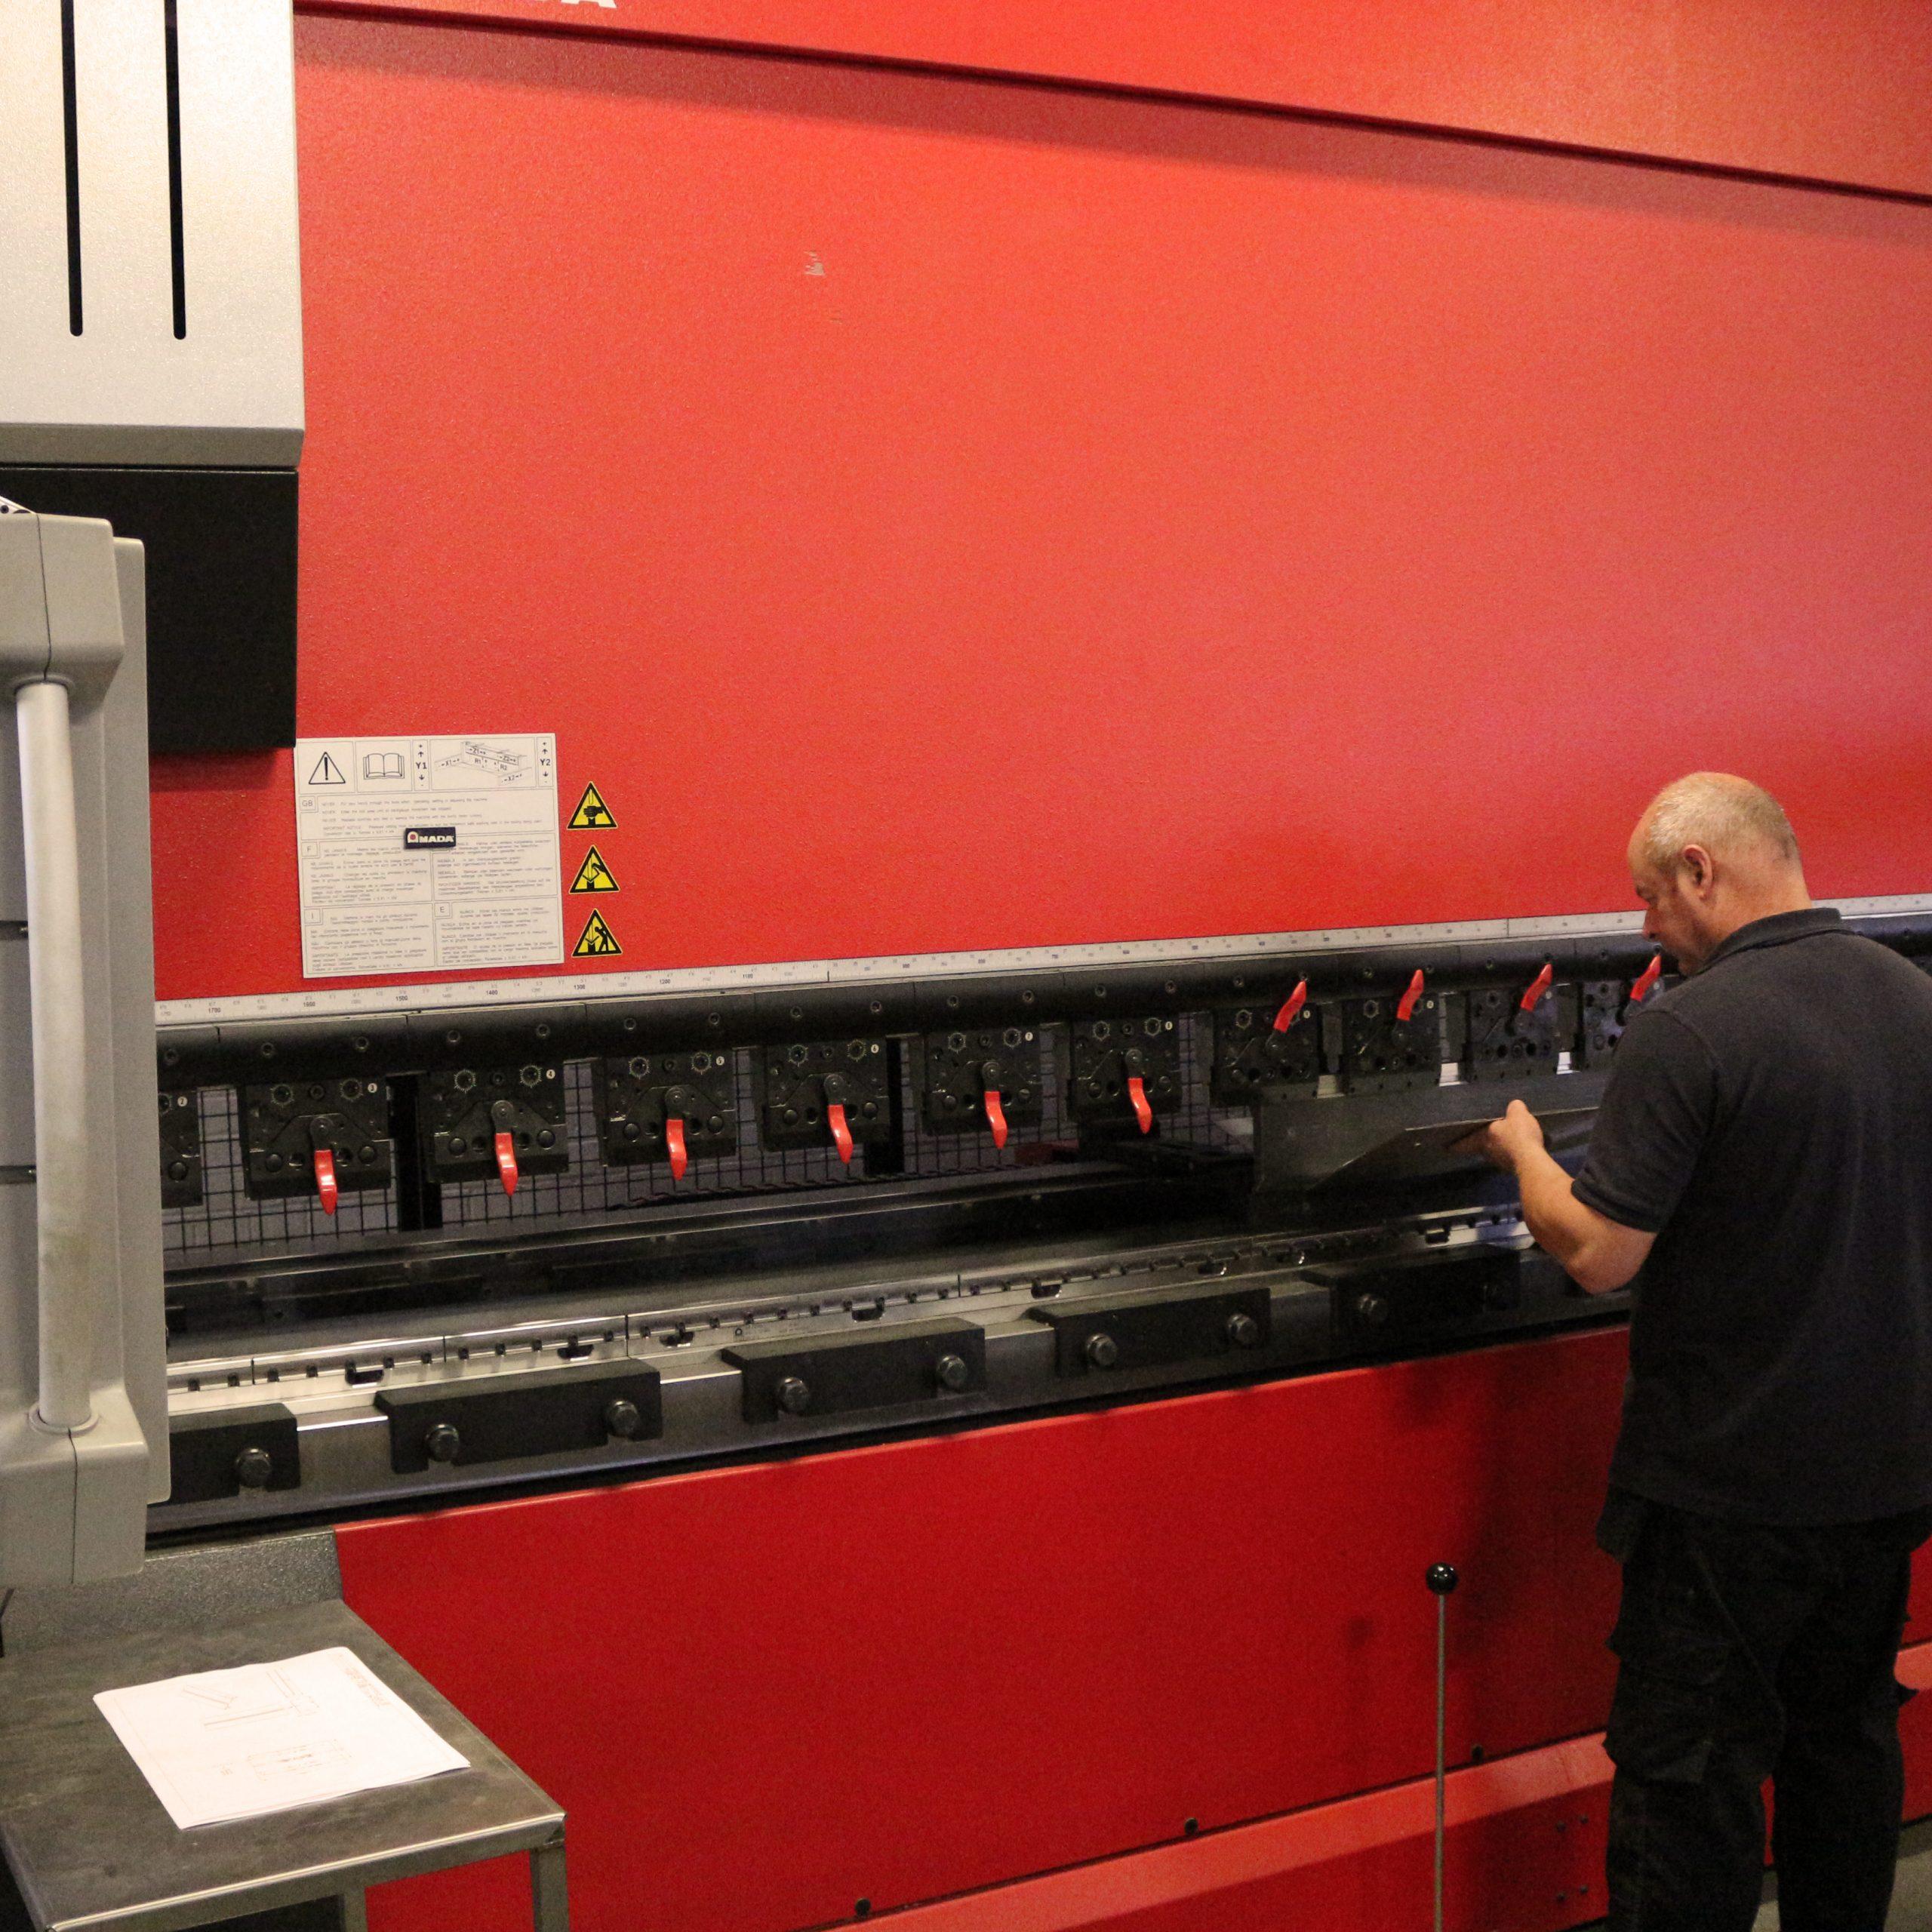 AMADA folding press